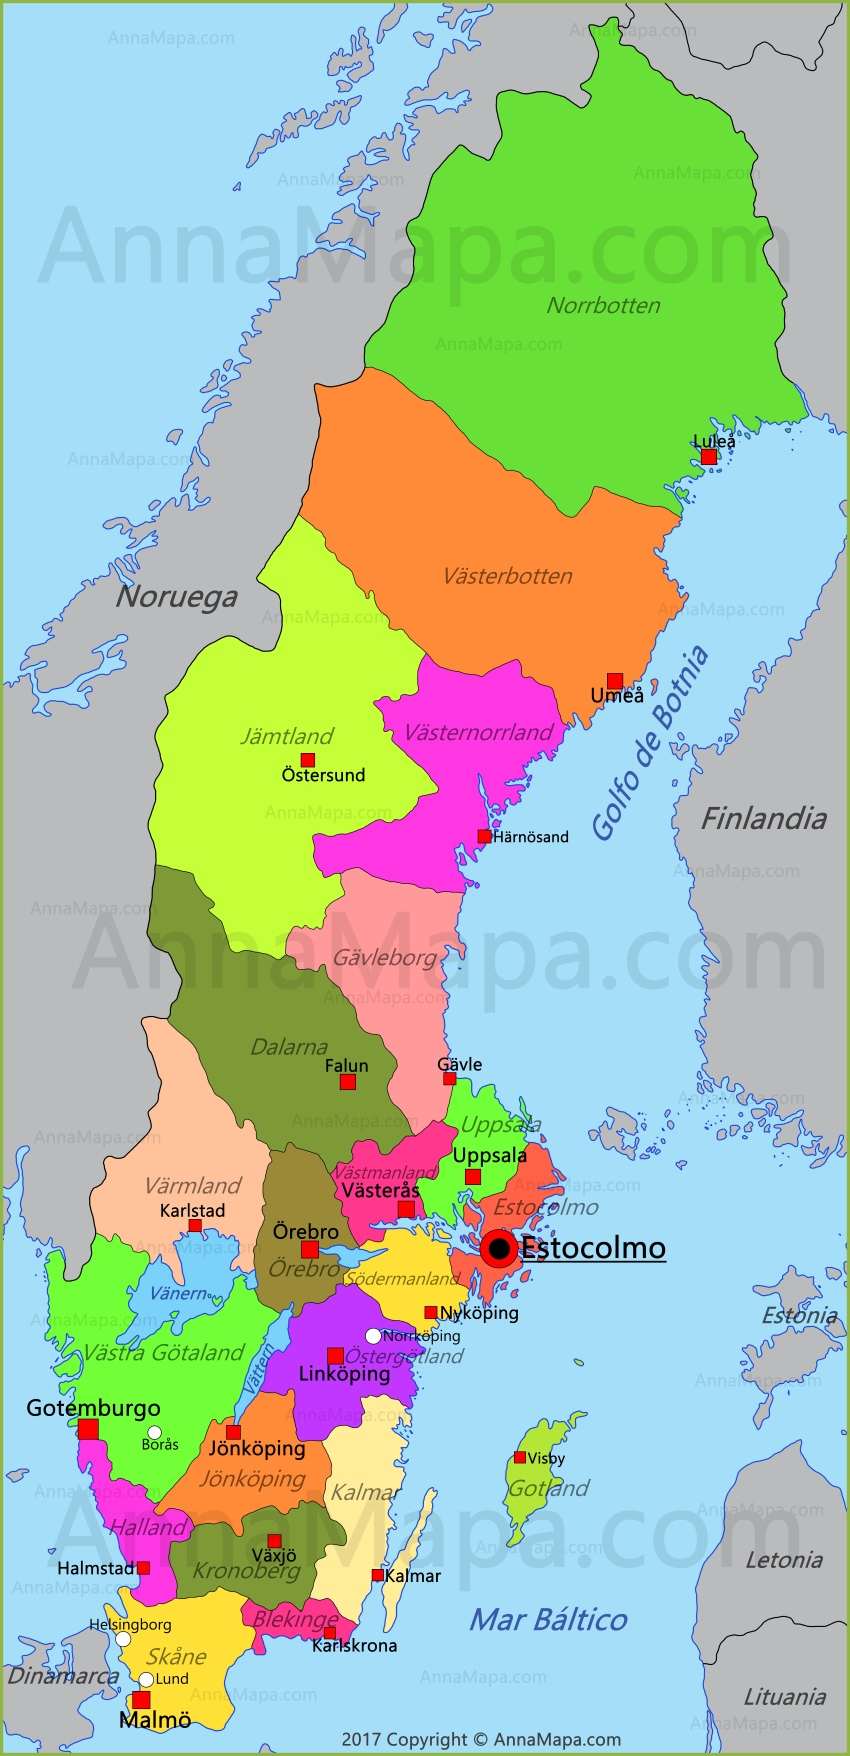 suecia mapa Mapa de Suecia   AnnaMapa.com suecia mapa